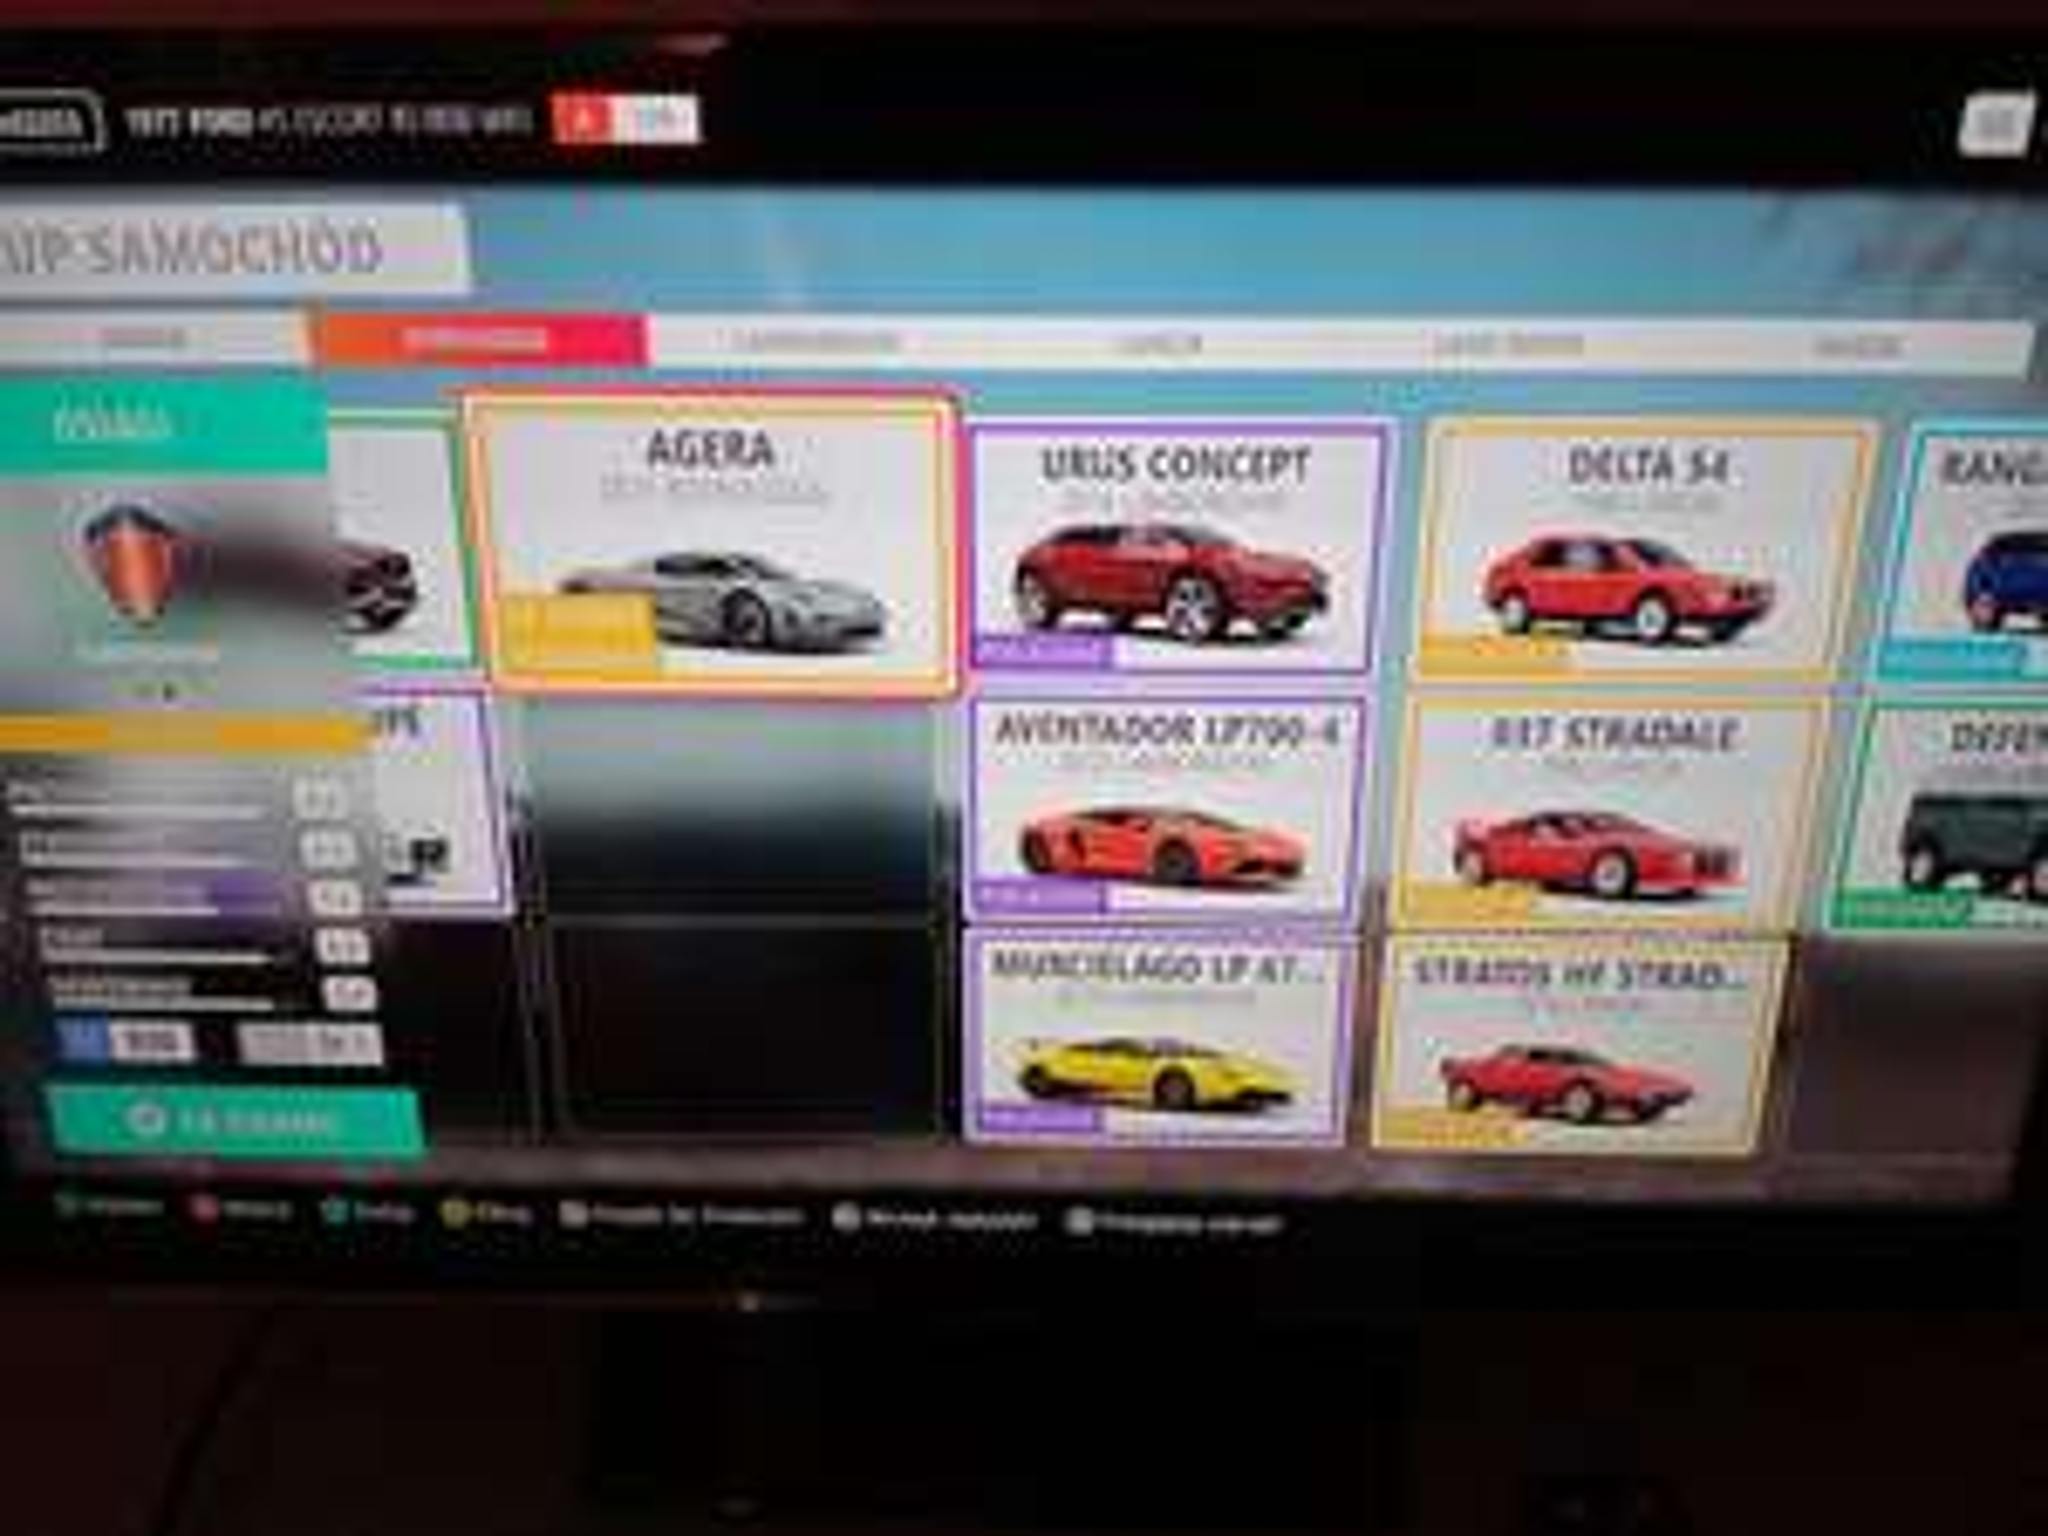 Forza horizon 4, darmowe samochody Koenigsegg agera, Pagani, Maserati